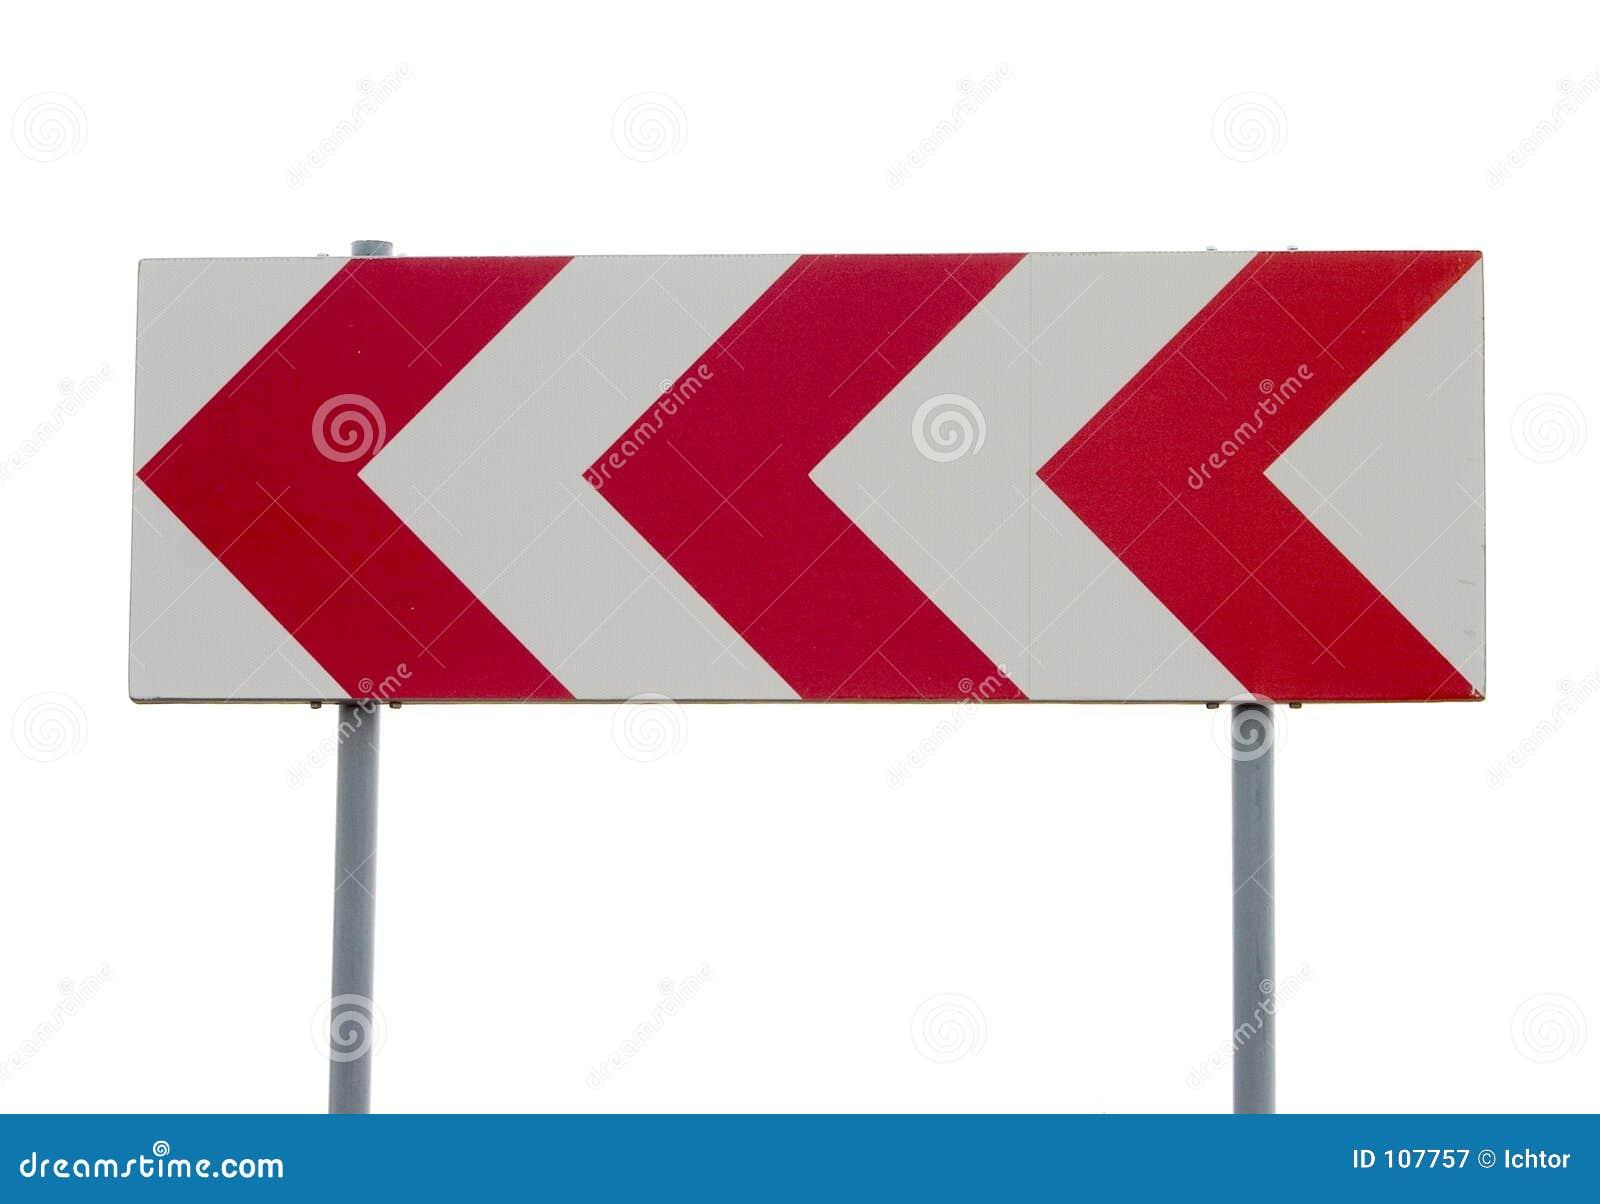 движение знака